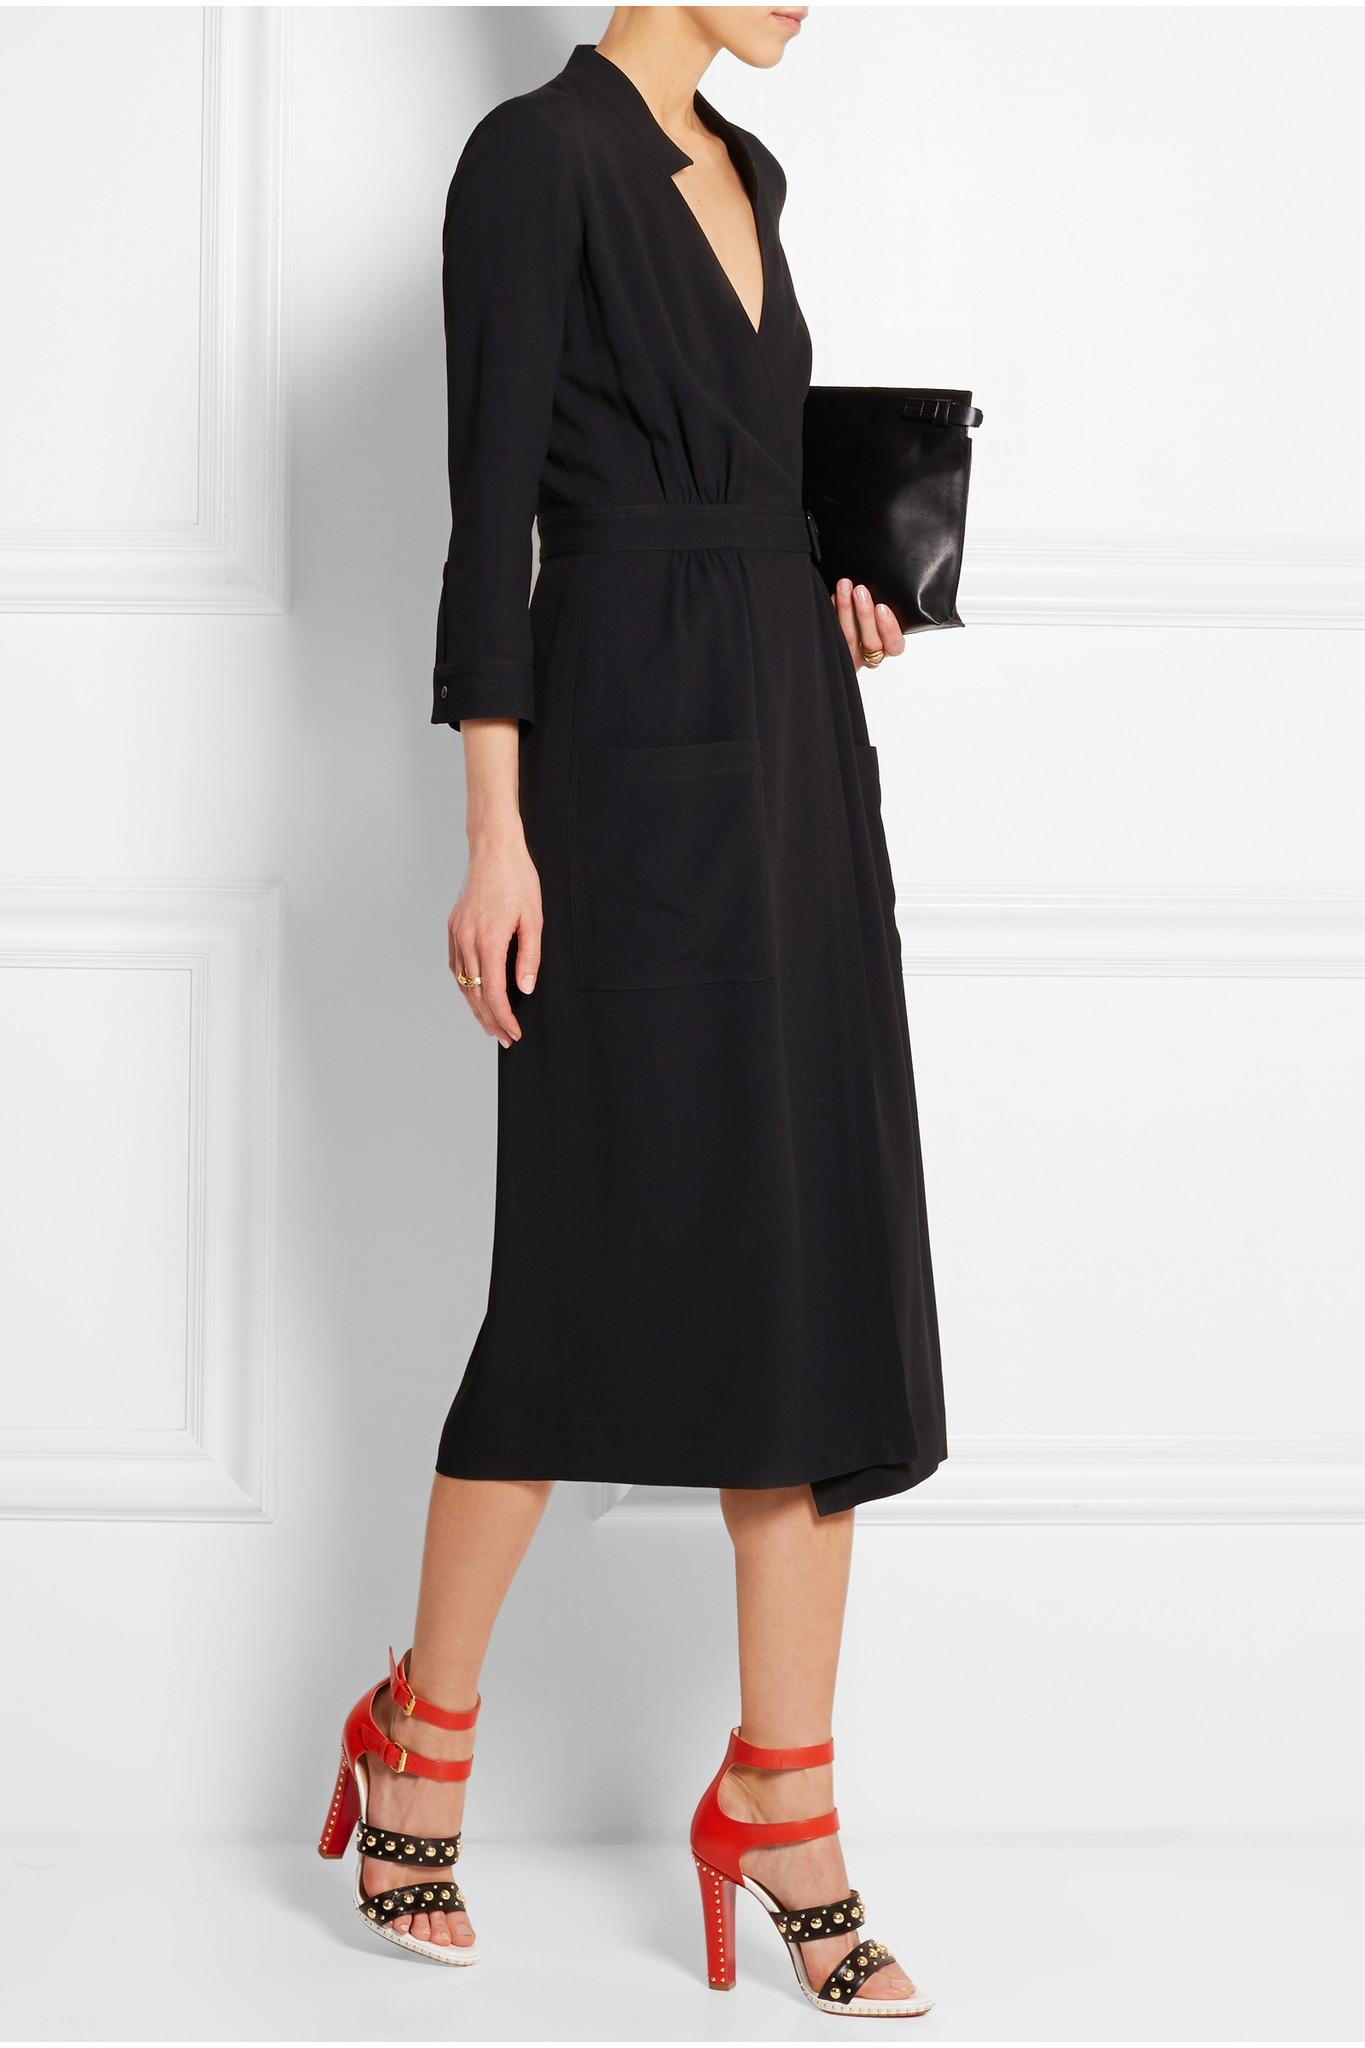 replica mens dress shoes - christian louboutin decodame 120 sandals, christian louboutin prices